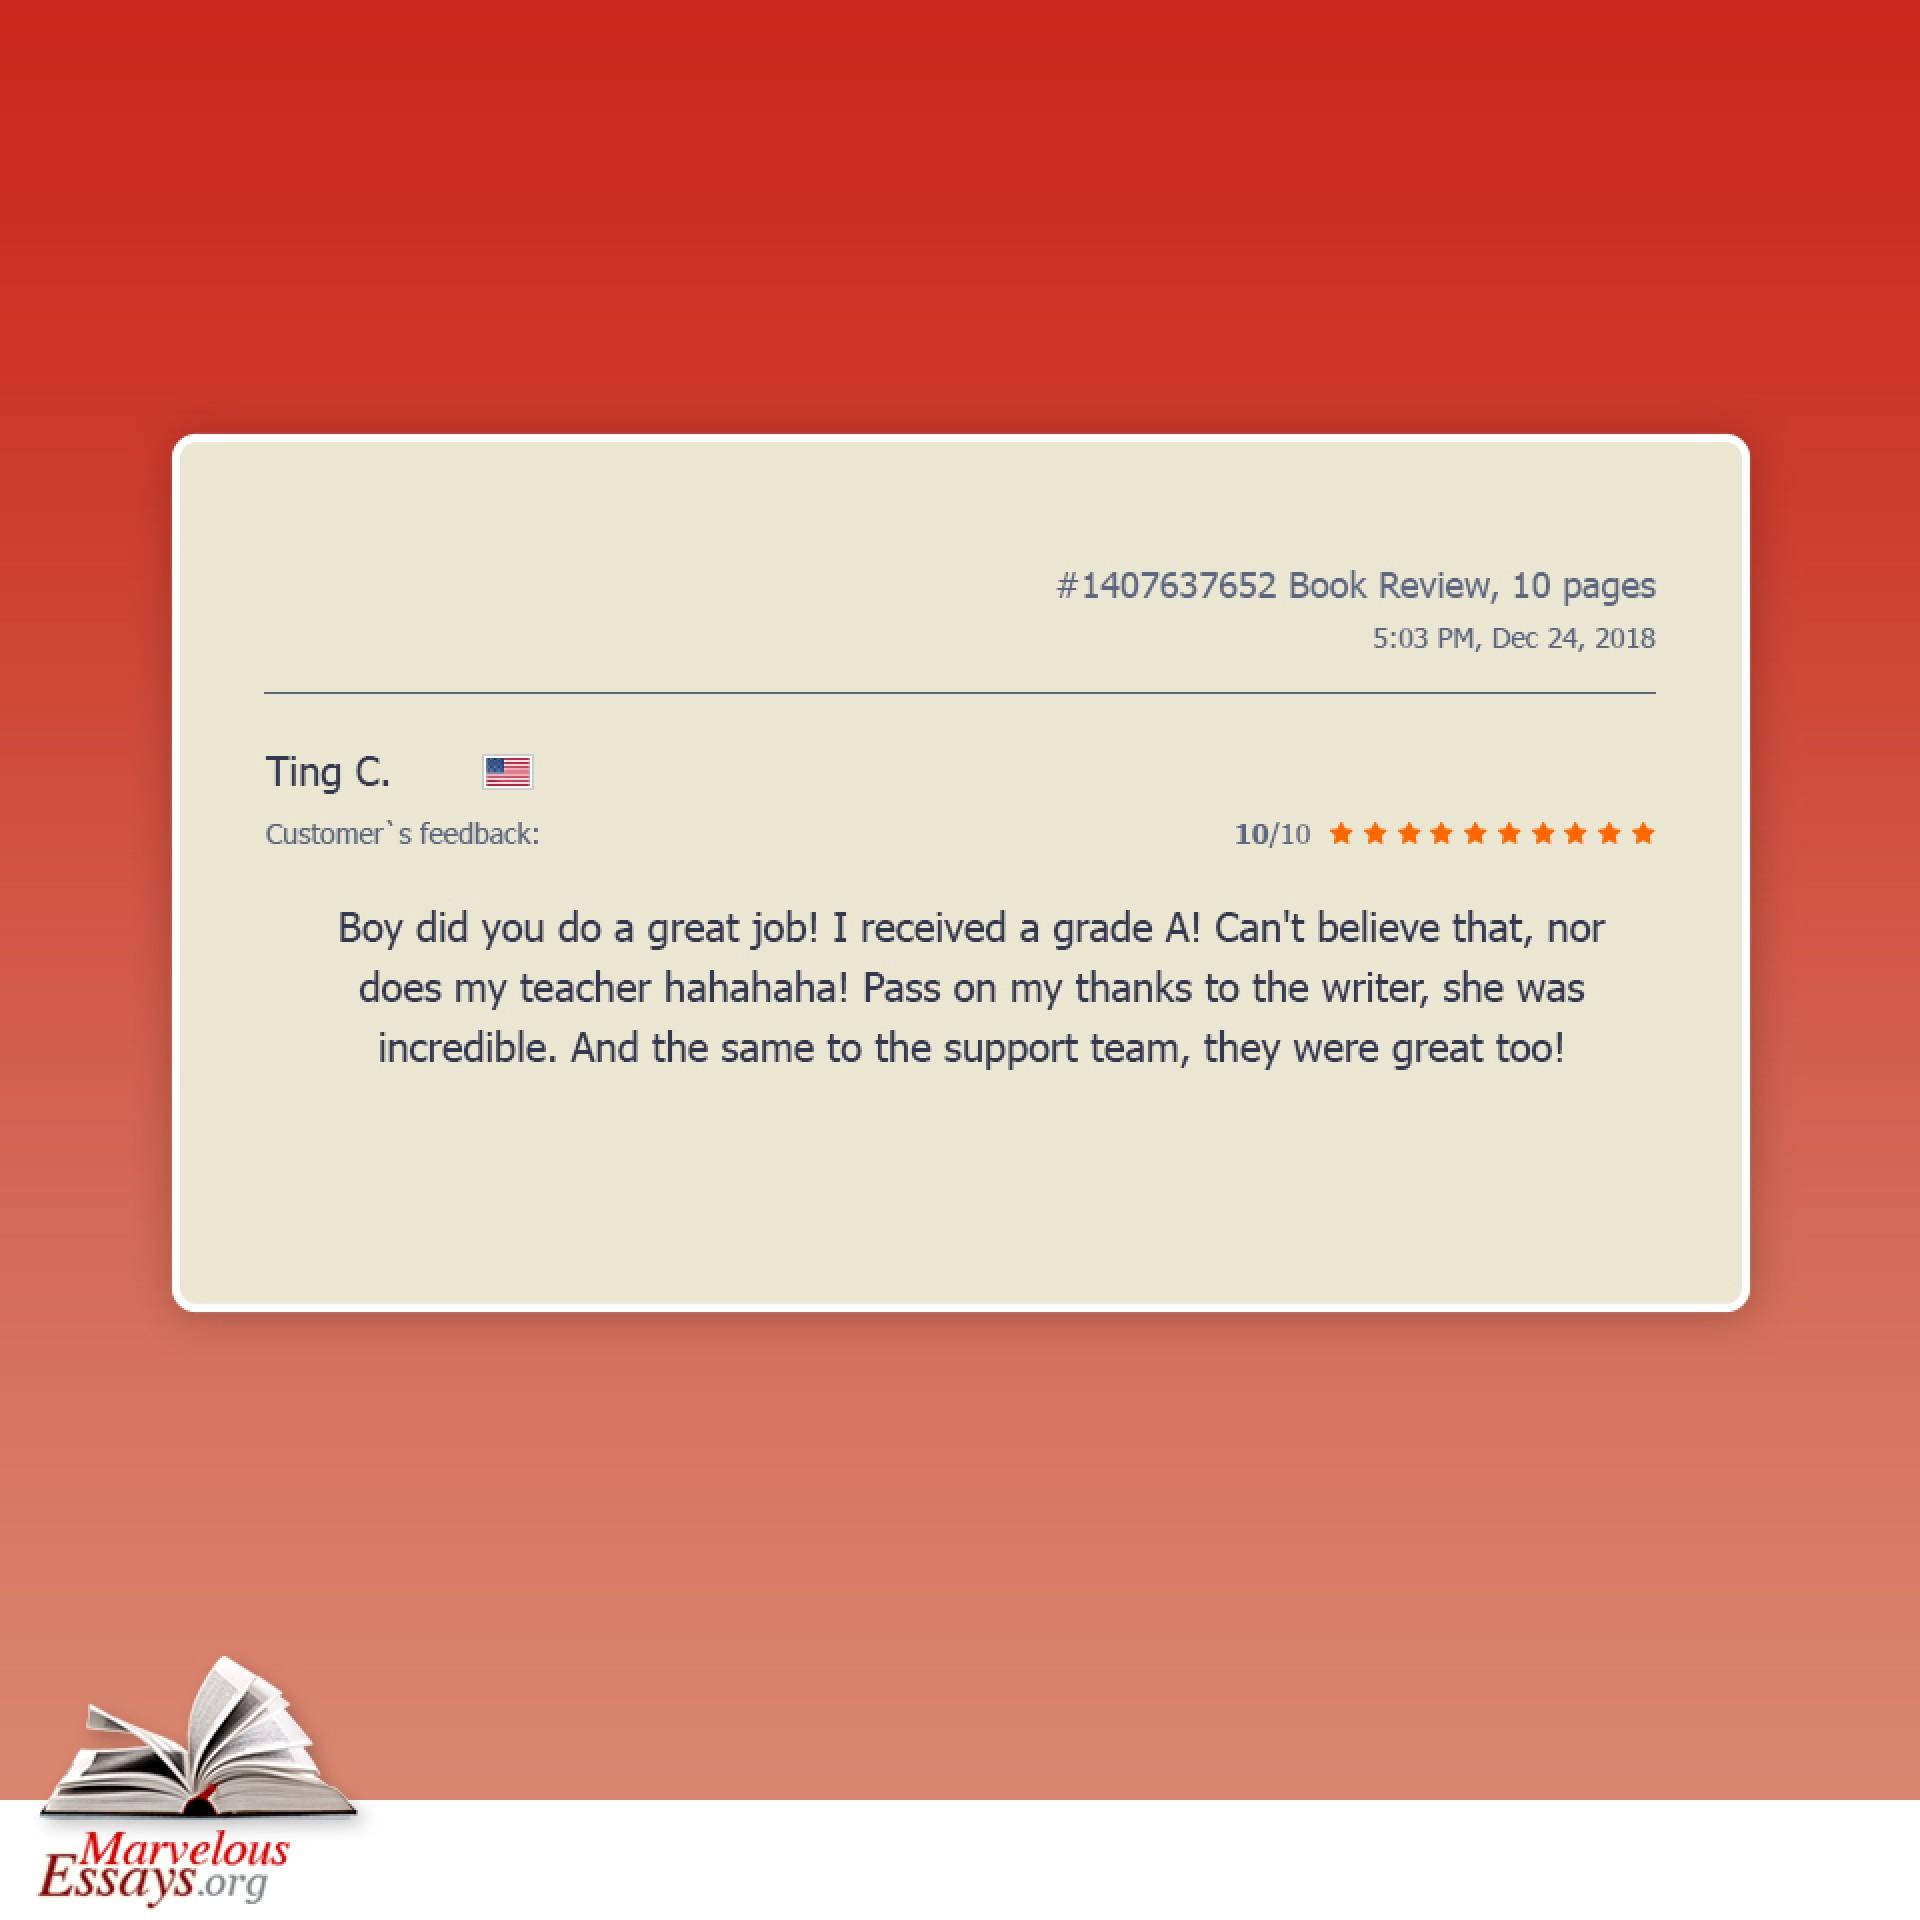 002 Marvelousessays Org Feedback 960x960 Essay Example Marvelous Breathtaking Essays English Discount Code Uk 1920